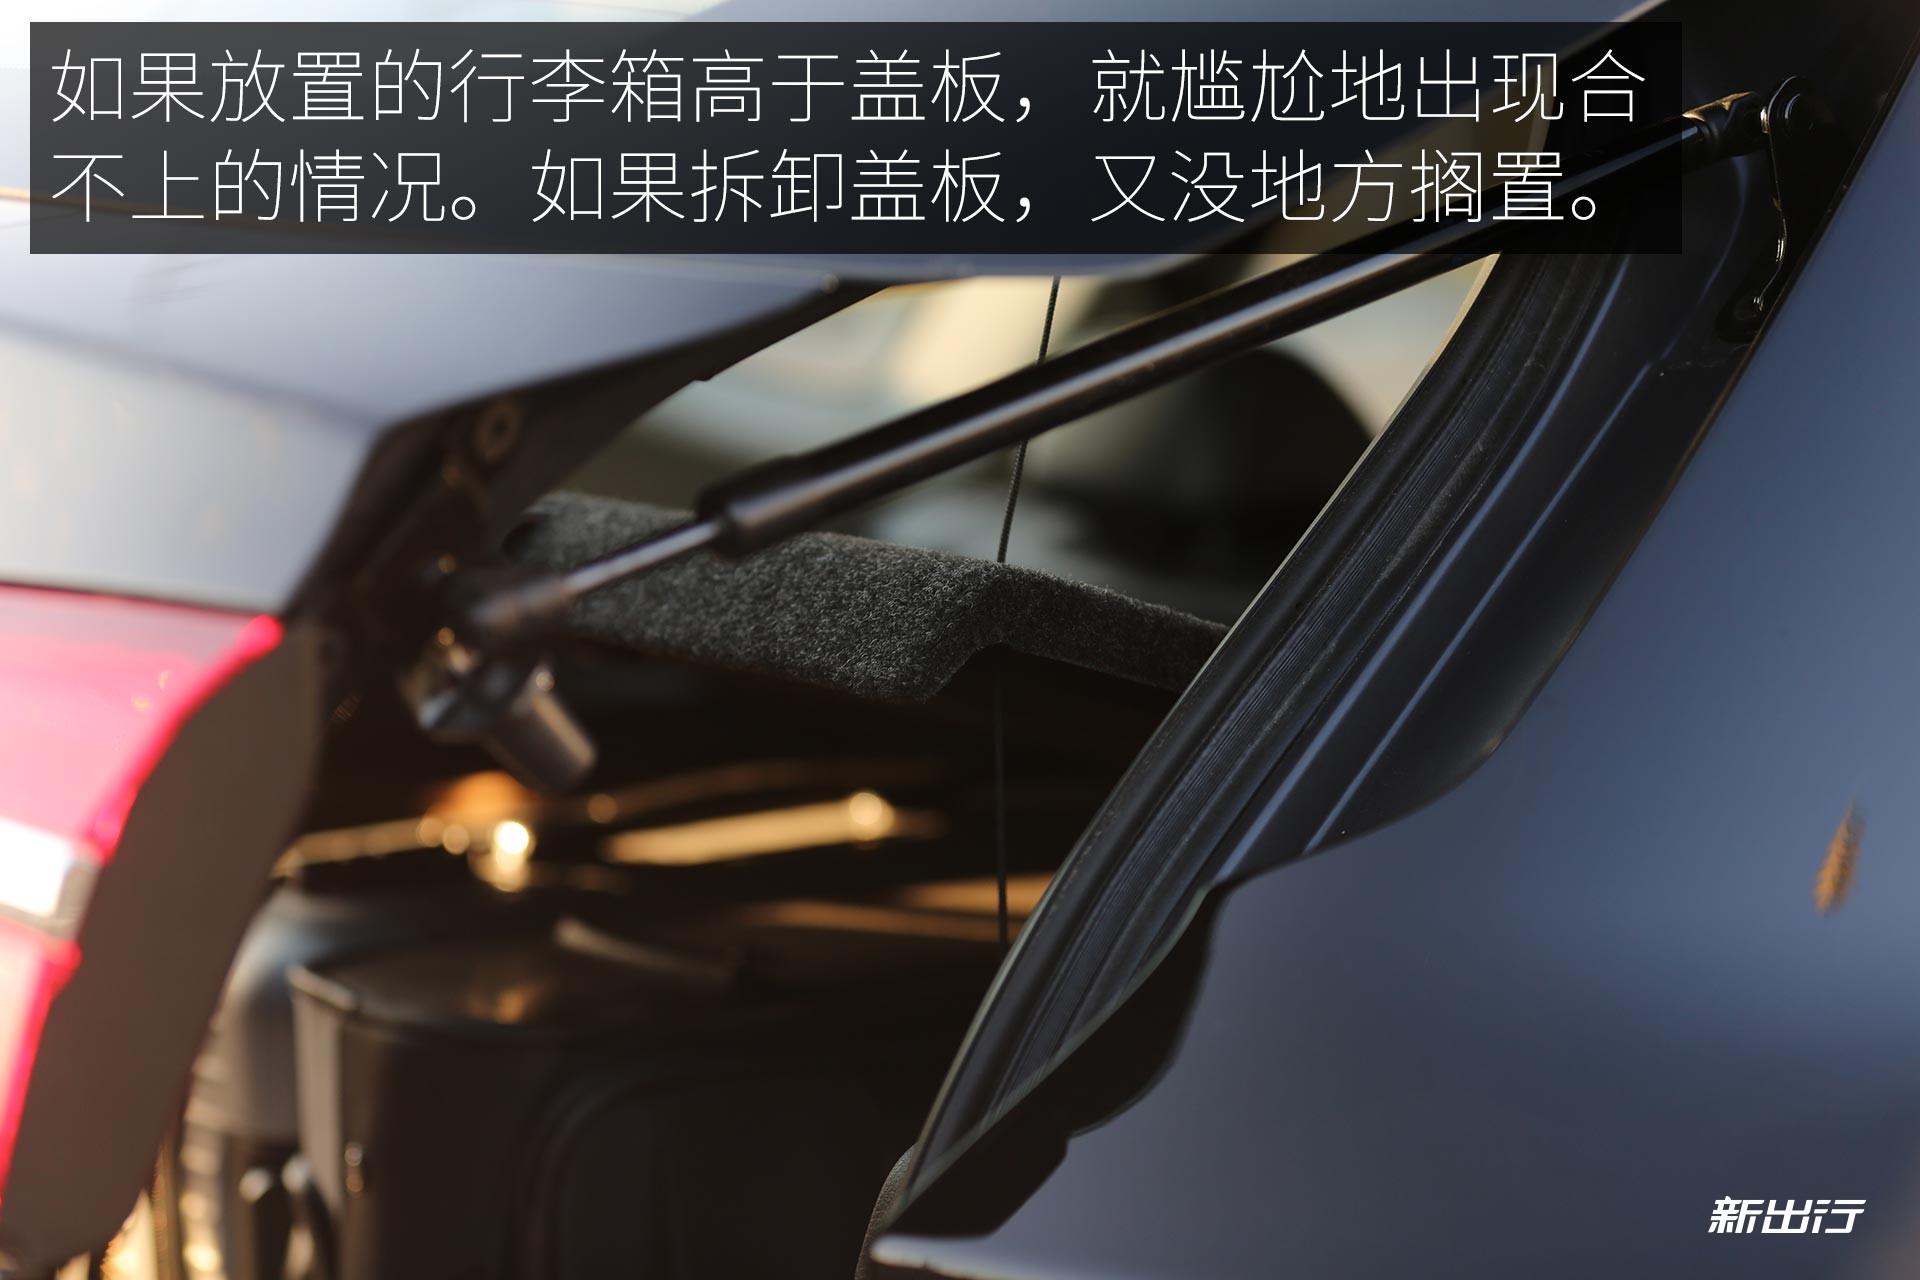 Rowe_eRX5_PHEV_KJ_27_01.jpg